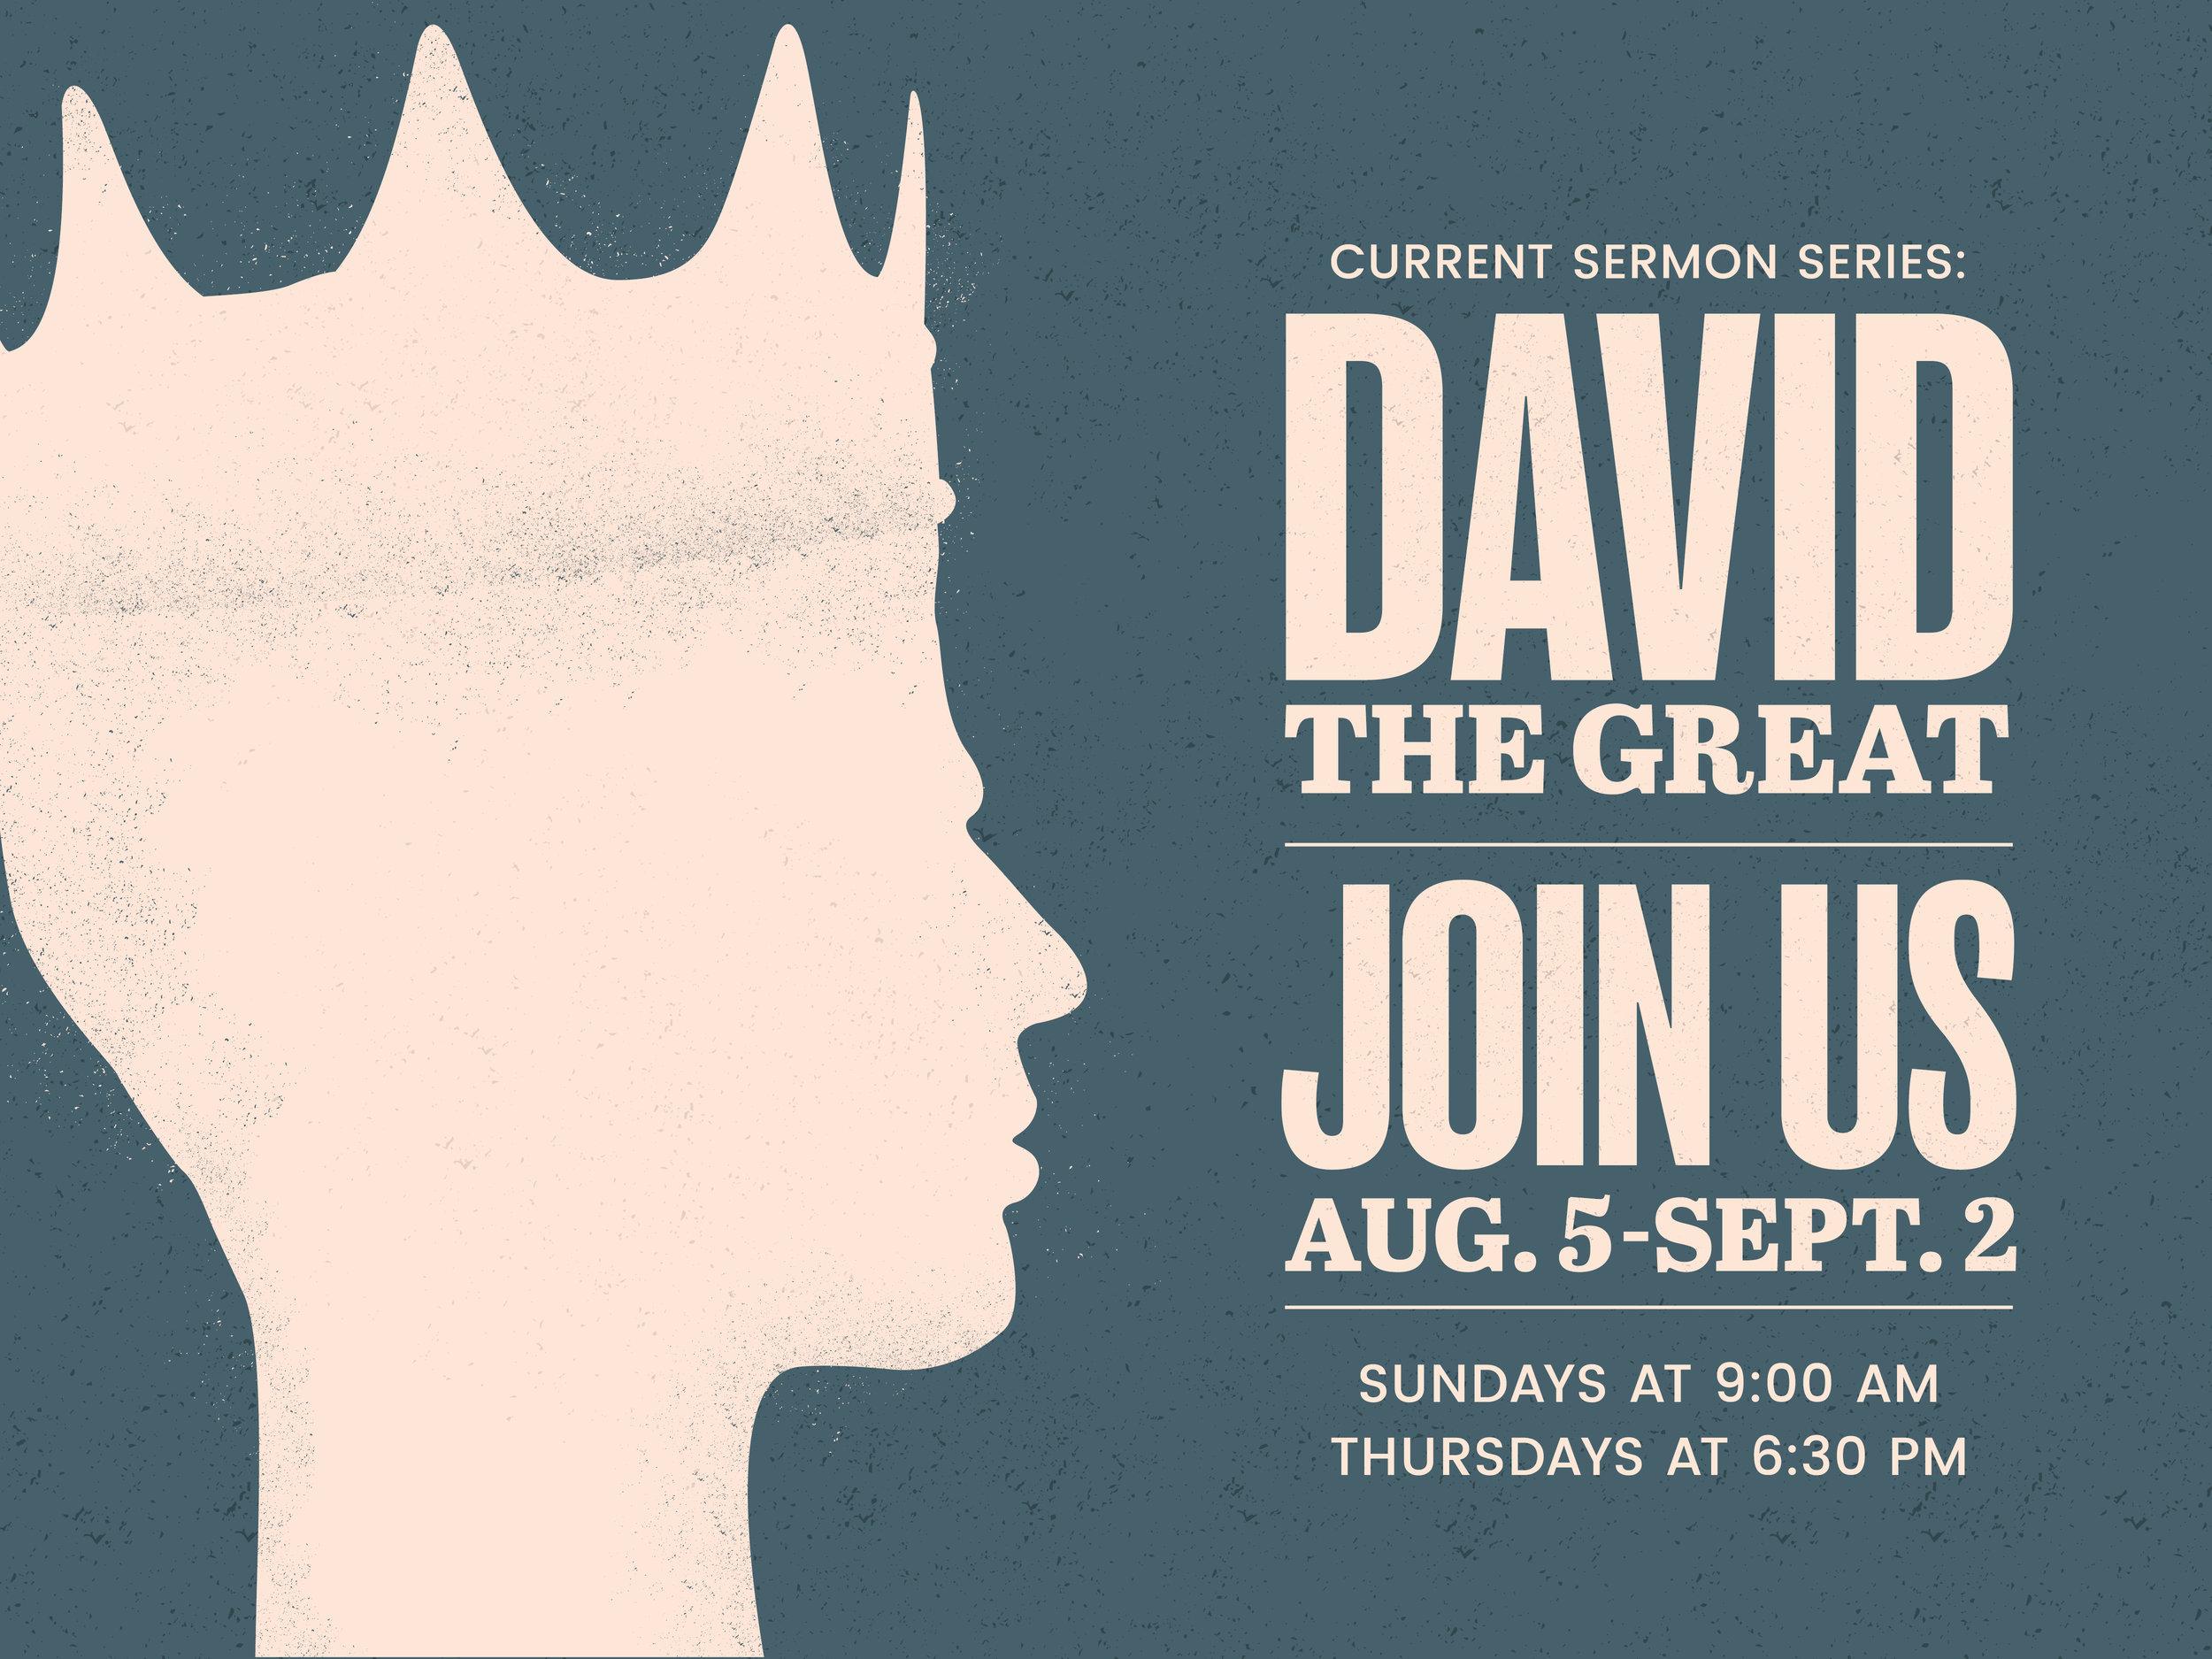 David-TheGreat_SermonSeries-FB_POSTS.jpg